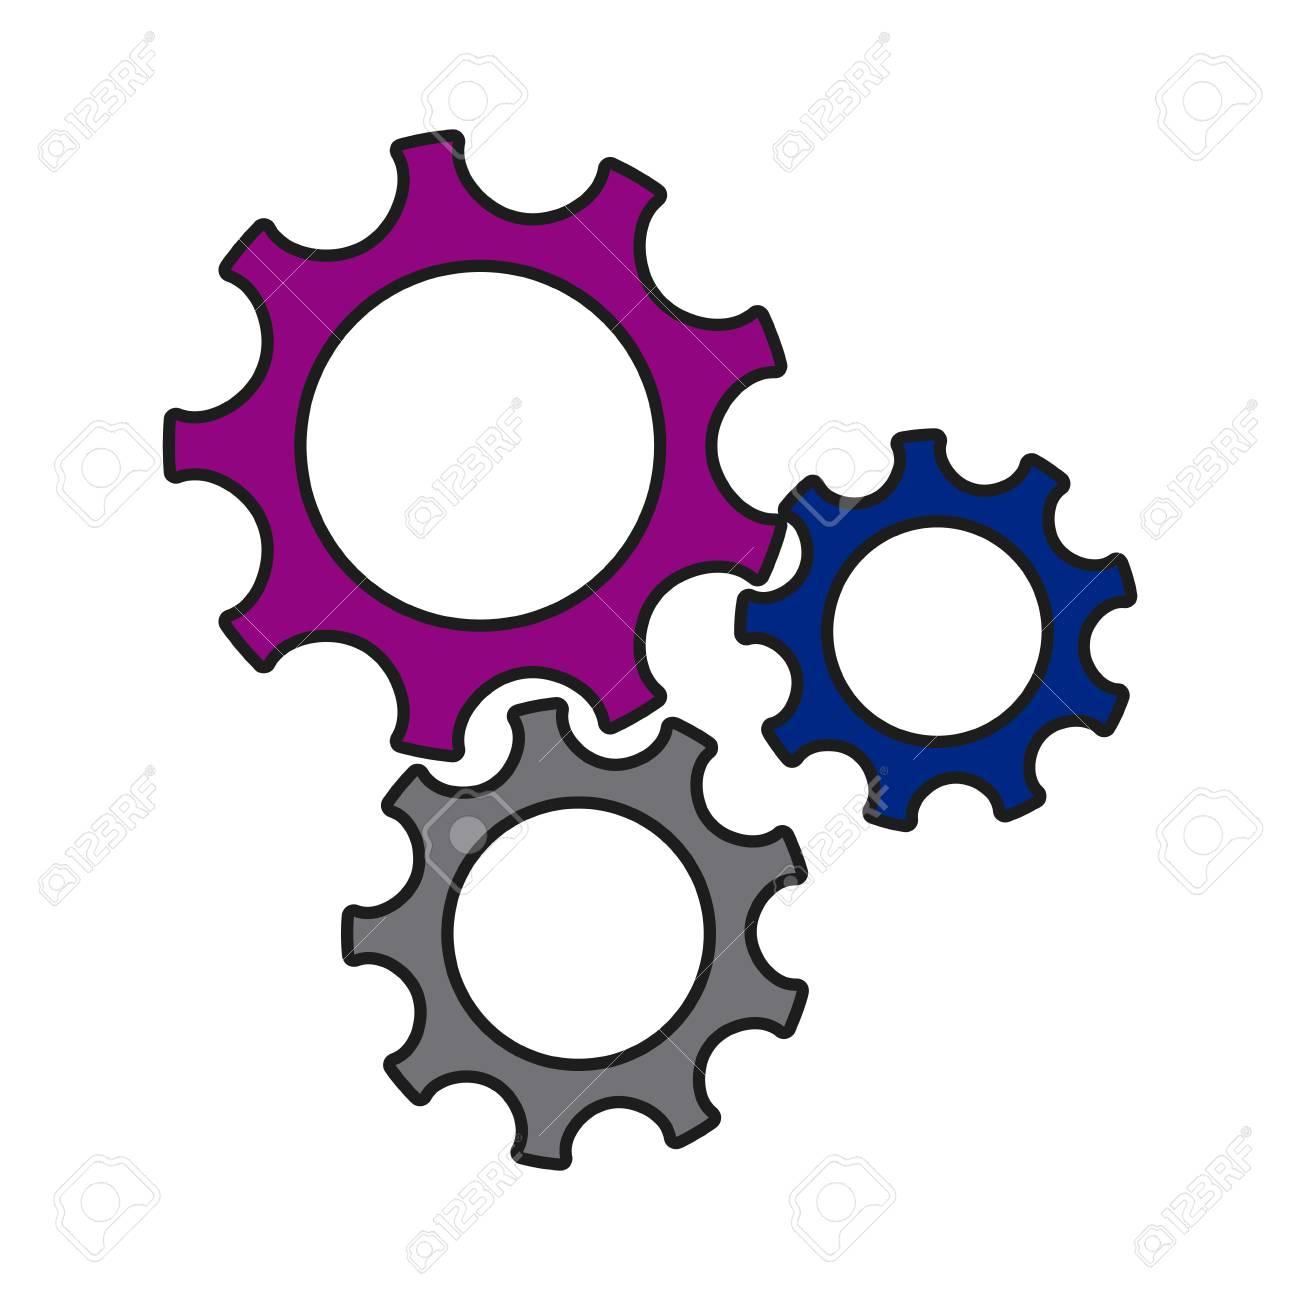 1300x1300 Gears Wheel Cogs Teamwork Idea Collaboration Vector Illustration